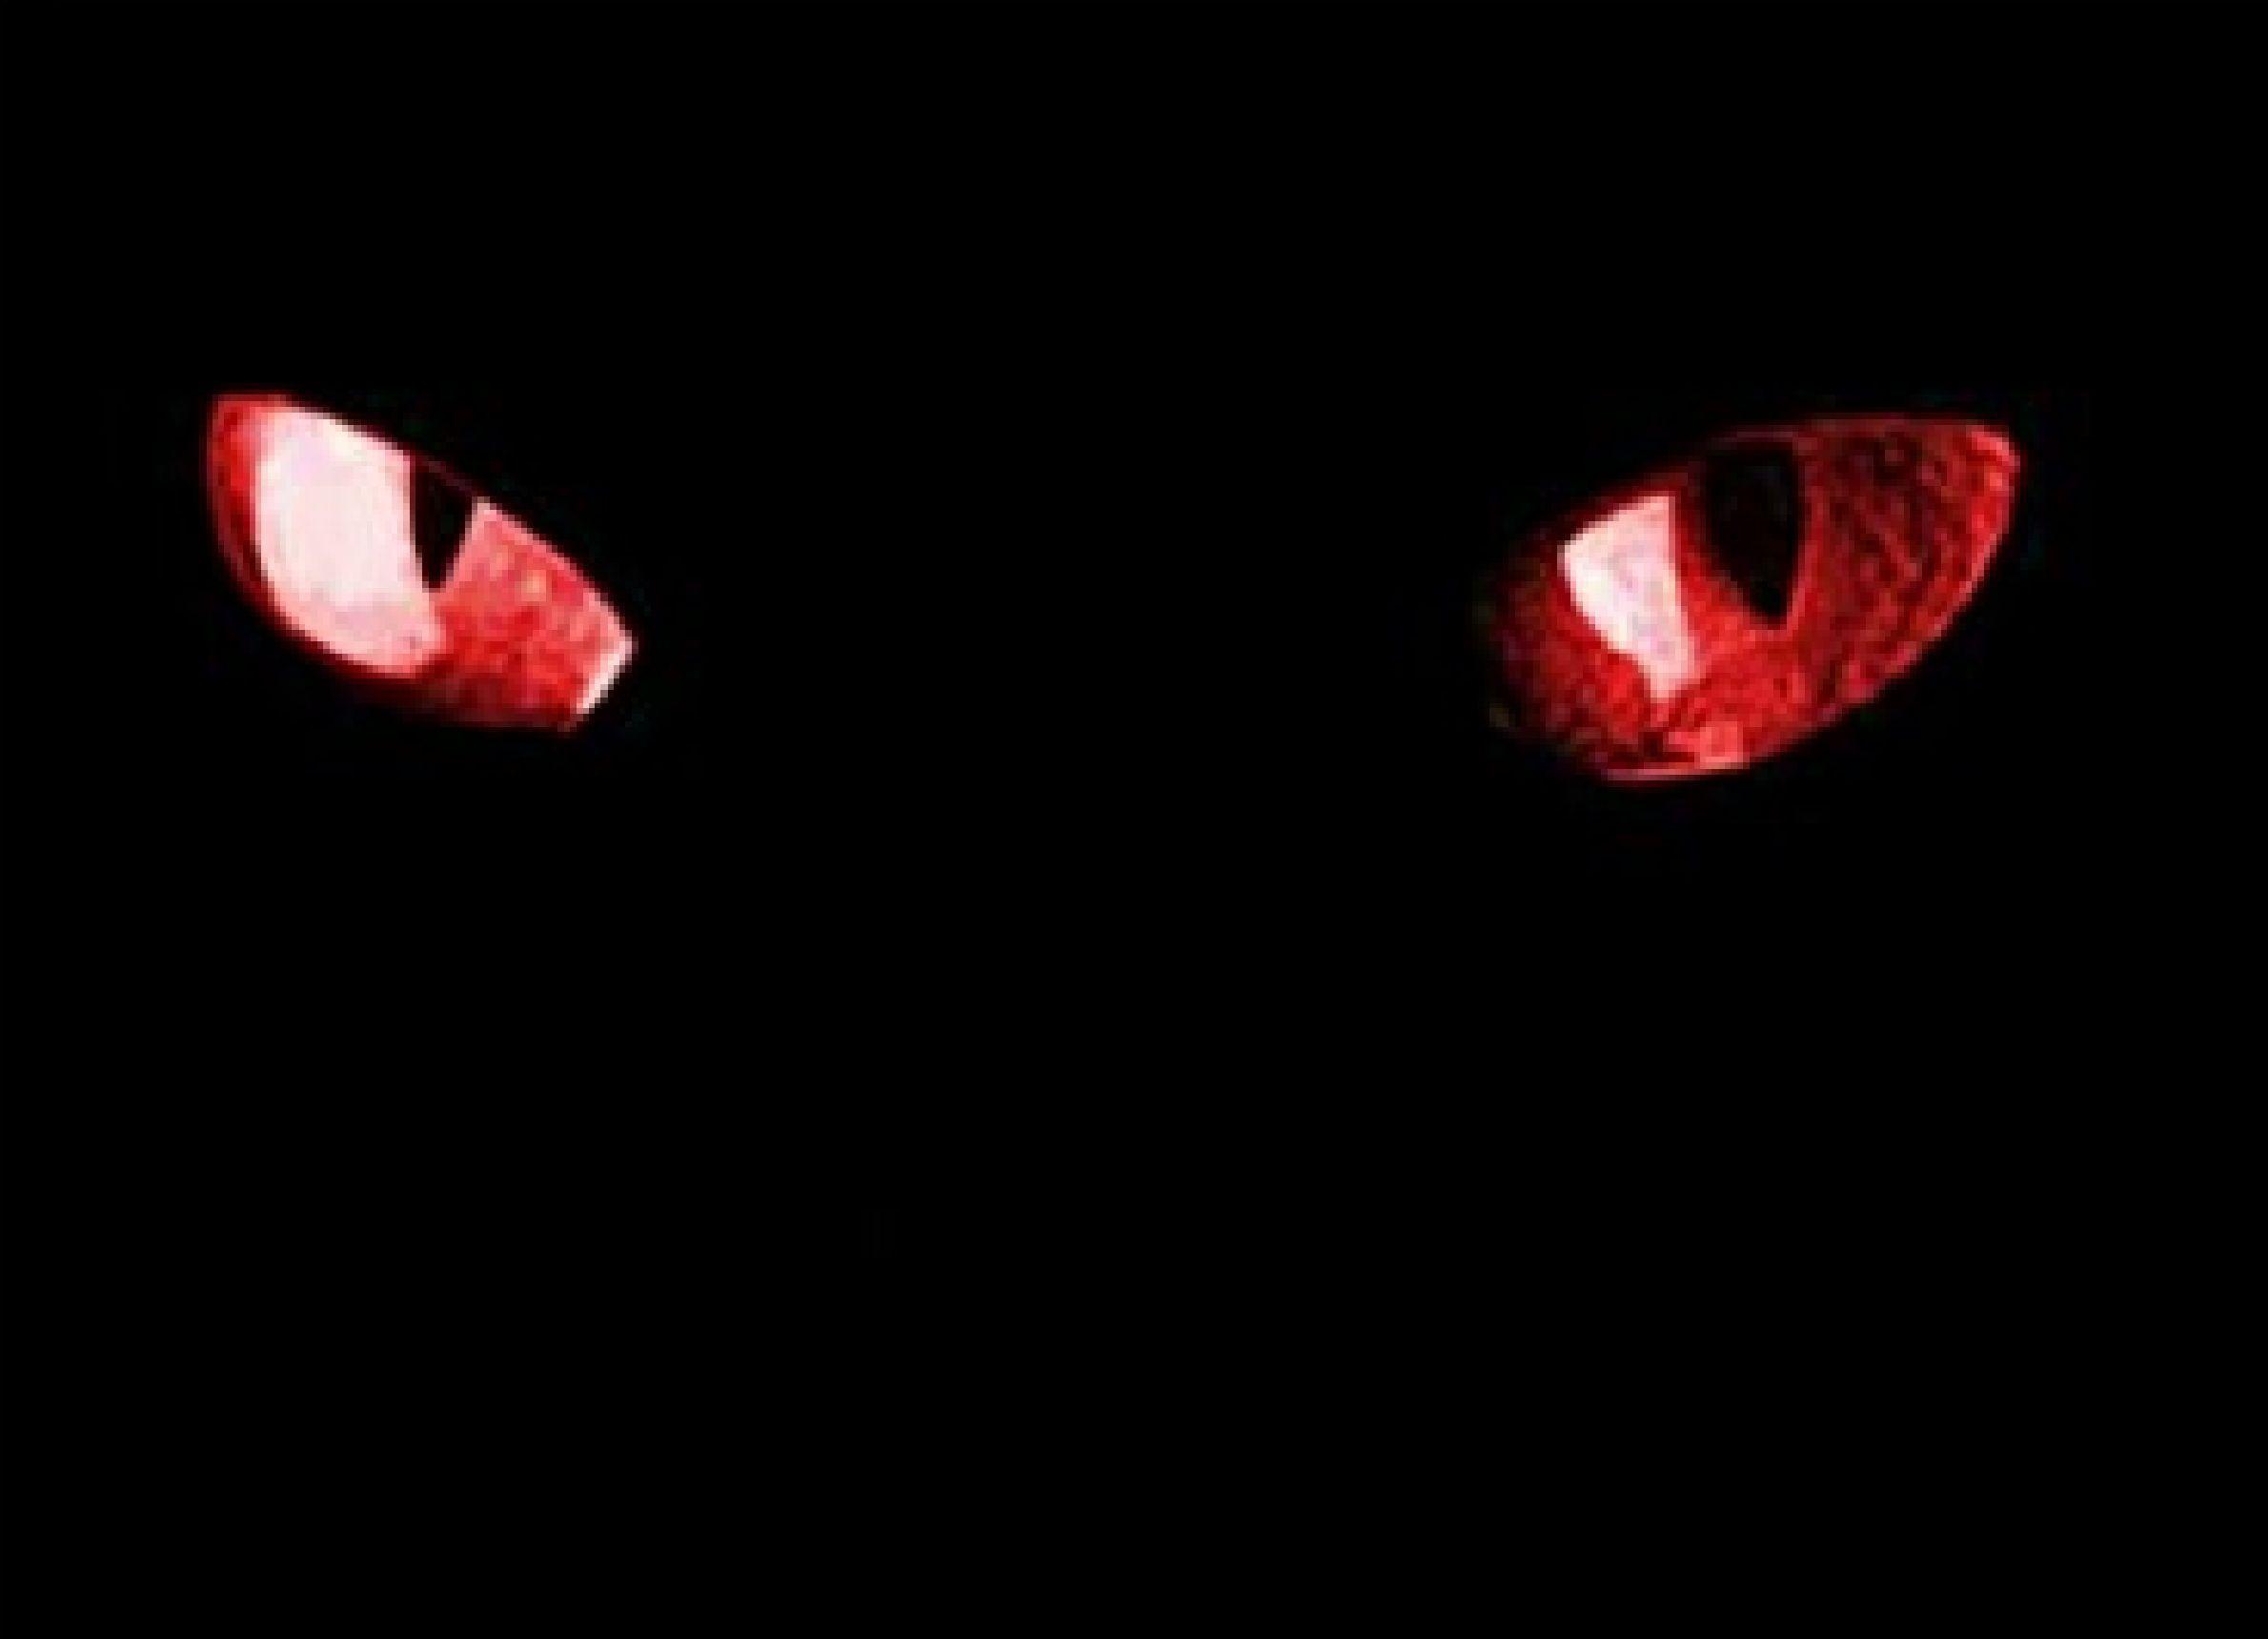 horror eye wallpaper hd - photo #25